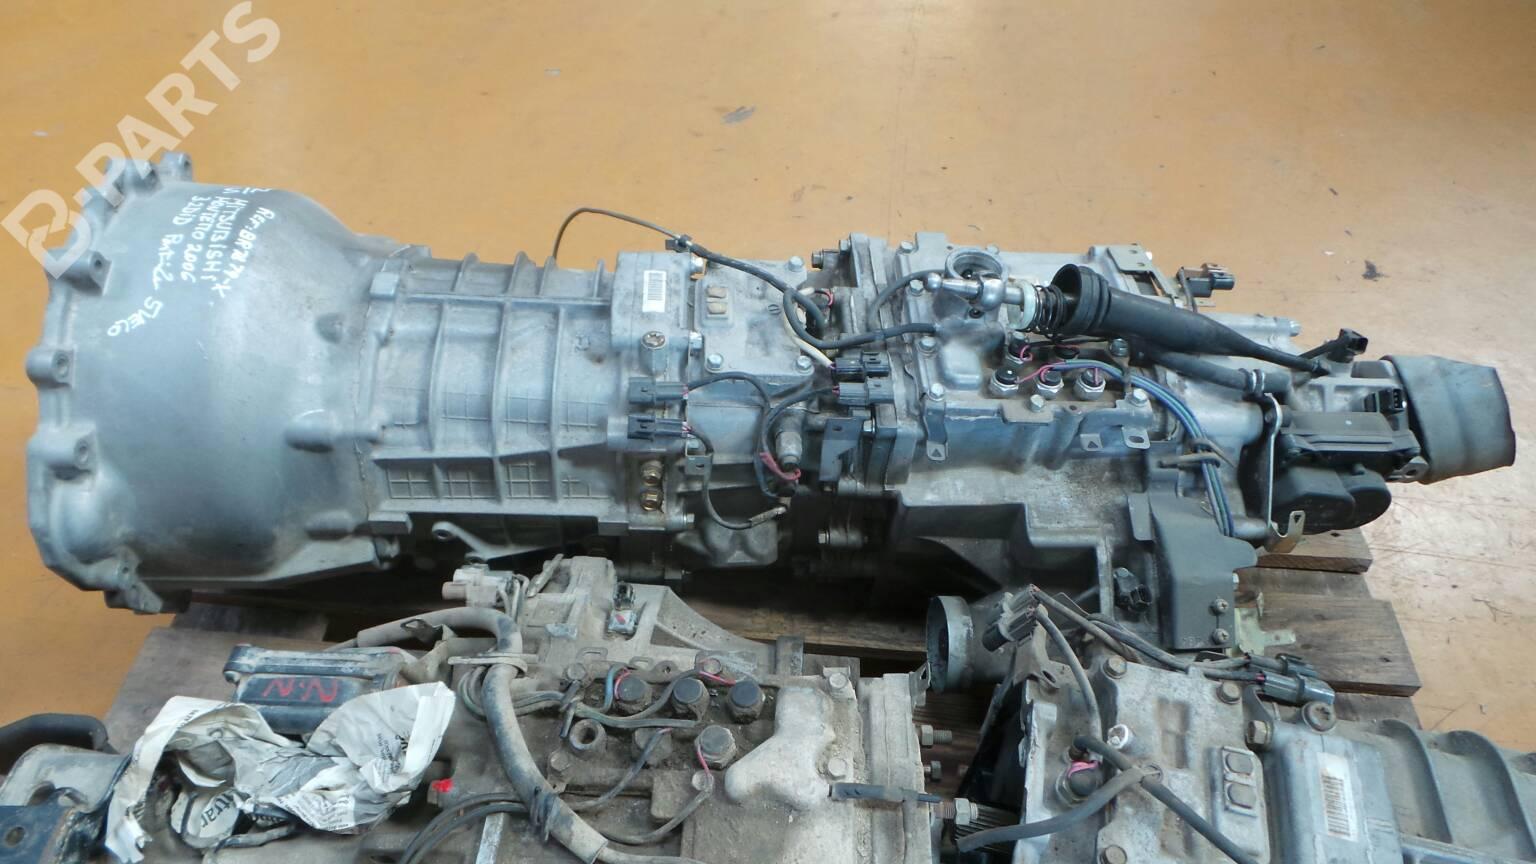 manual gearbox mitsubishi pajero iii v7 w v6 w 3 2 di d 27773 rh b parts com mitsubishi 4m41 engine repair manual mitsubishi 4m41 engine repair manual